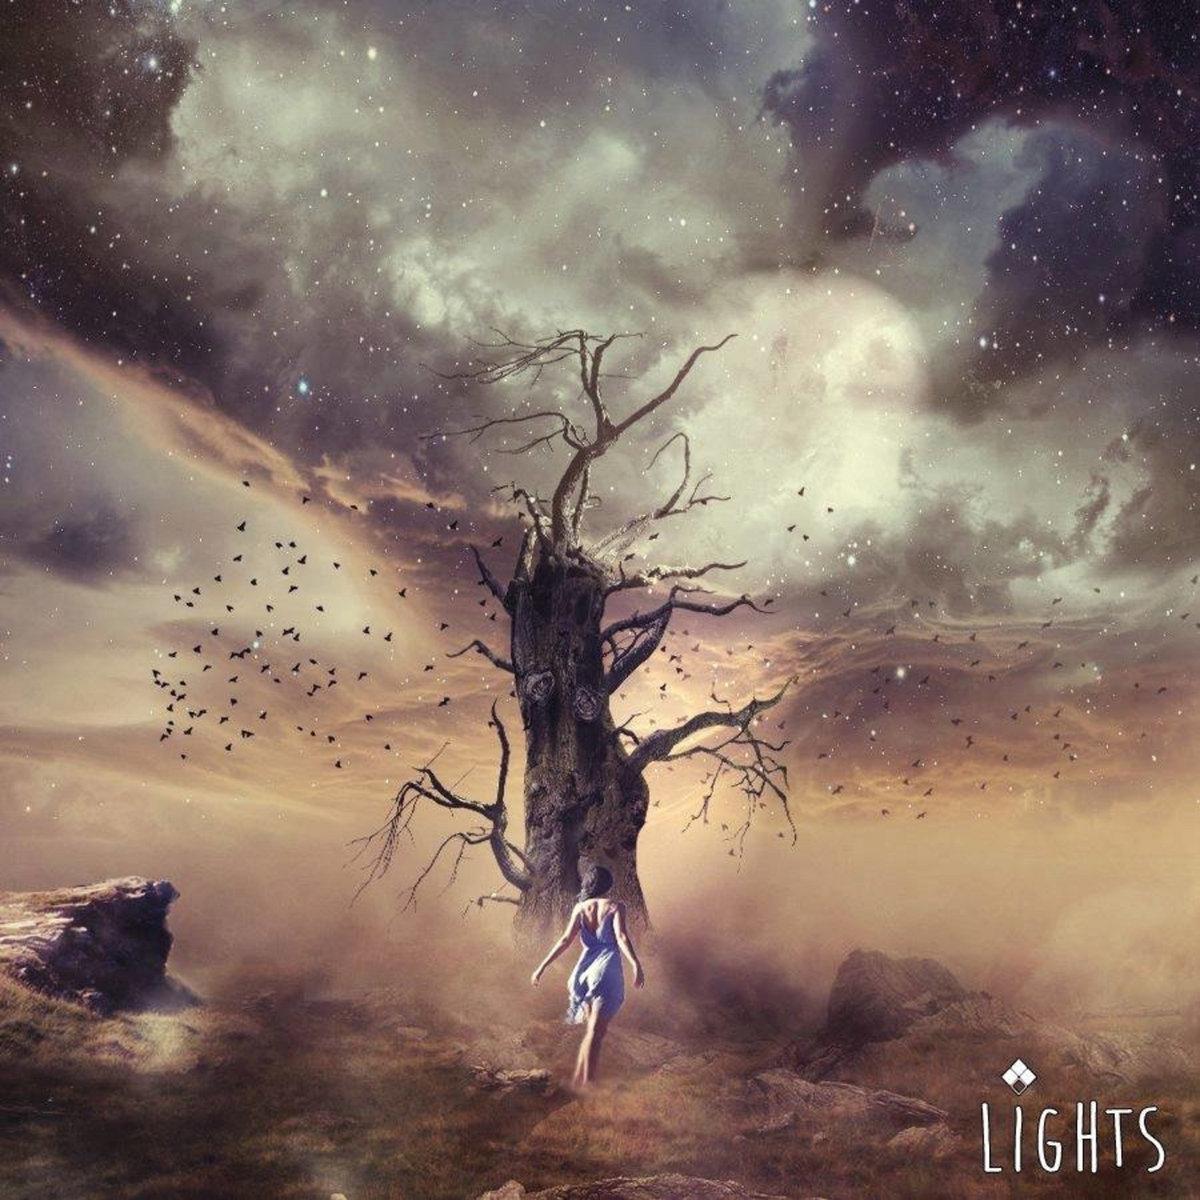 Varsity - Lights [EP] (2015)